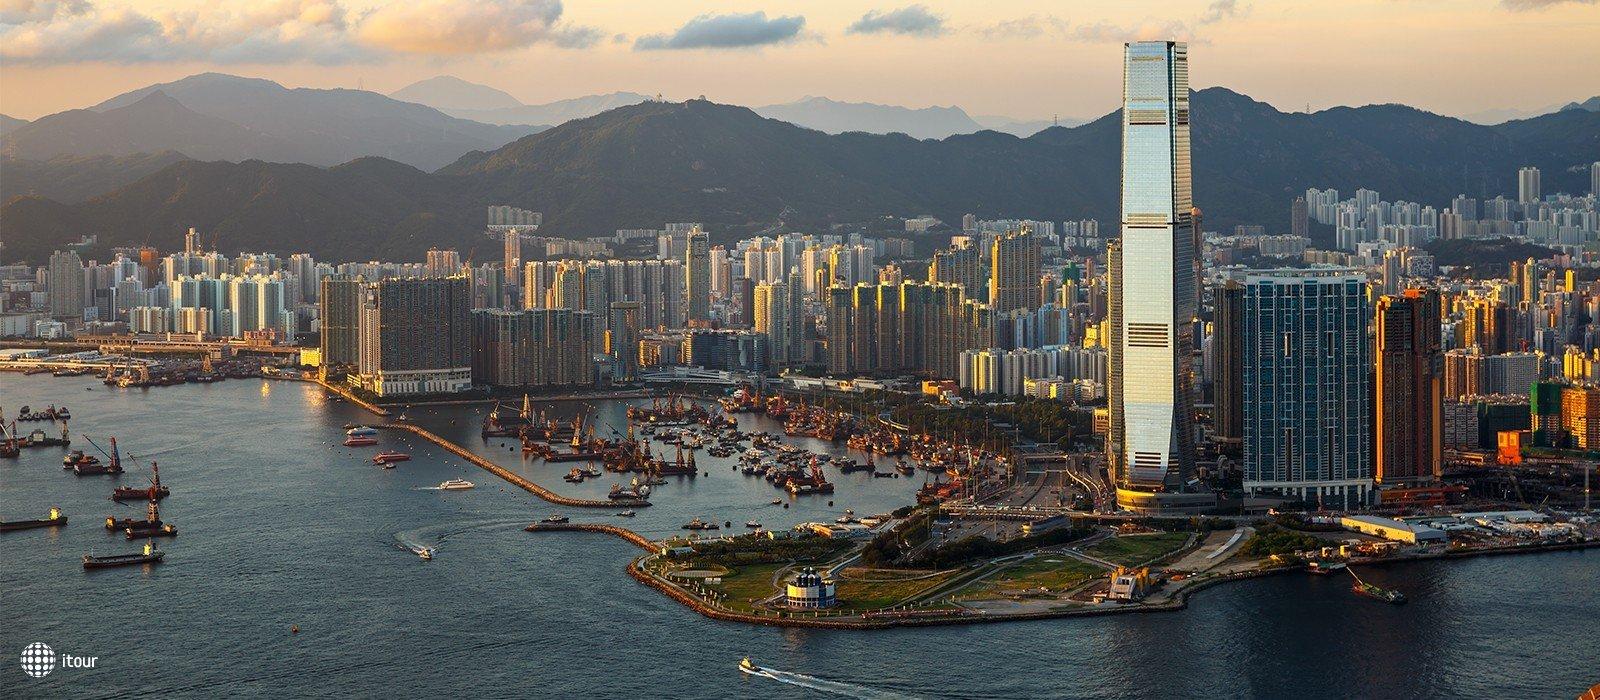 Kowloon Shangri-la 9